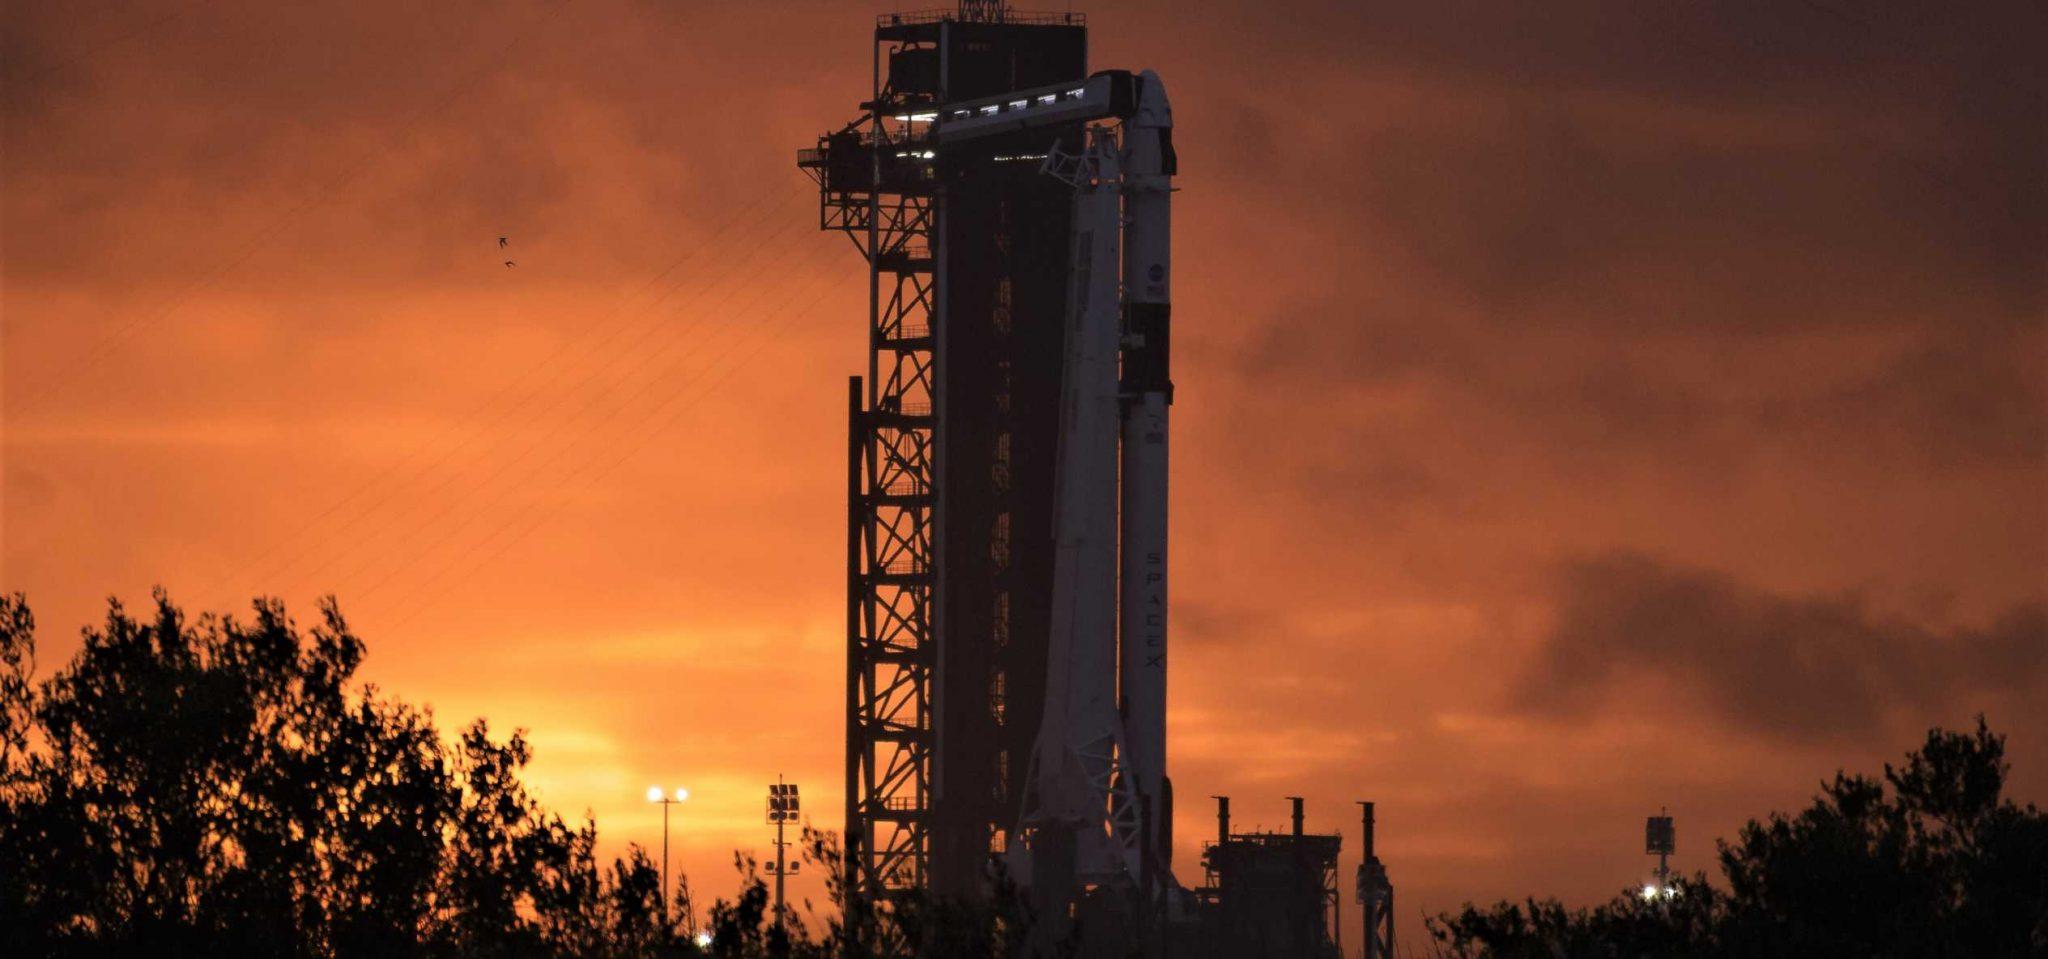 https://www.teslarati.com/wp-content/uploads/2020/05/Crew-Dragon-C206-F9-B1058-Demo-2-39A-052520-NASA-3-crop-2-c-2048x959.jpg